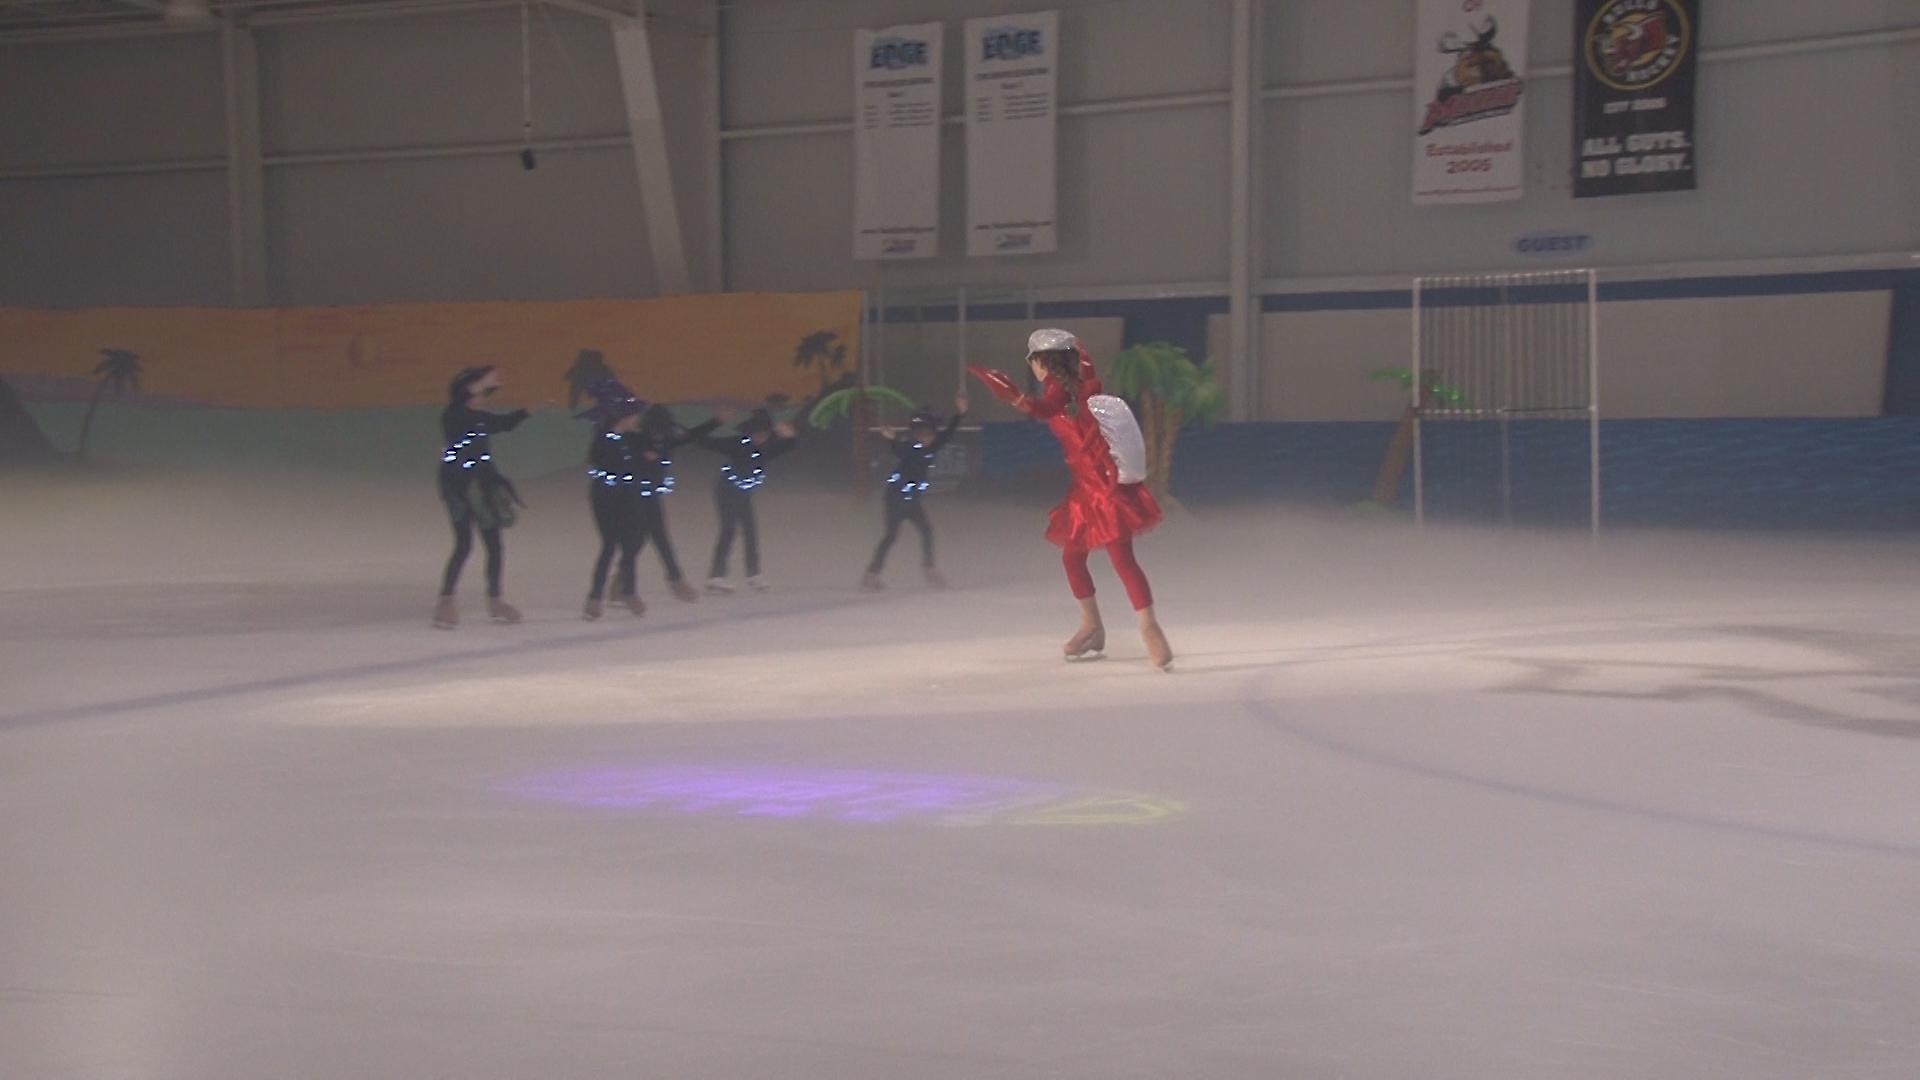 Power Play Maui Skate on Ice 071417.00_40_13_01.Still059.jpg